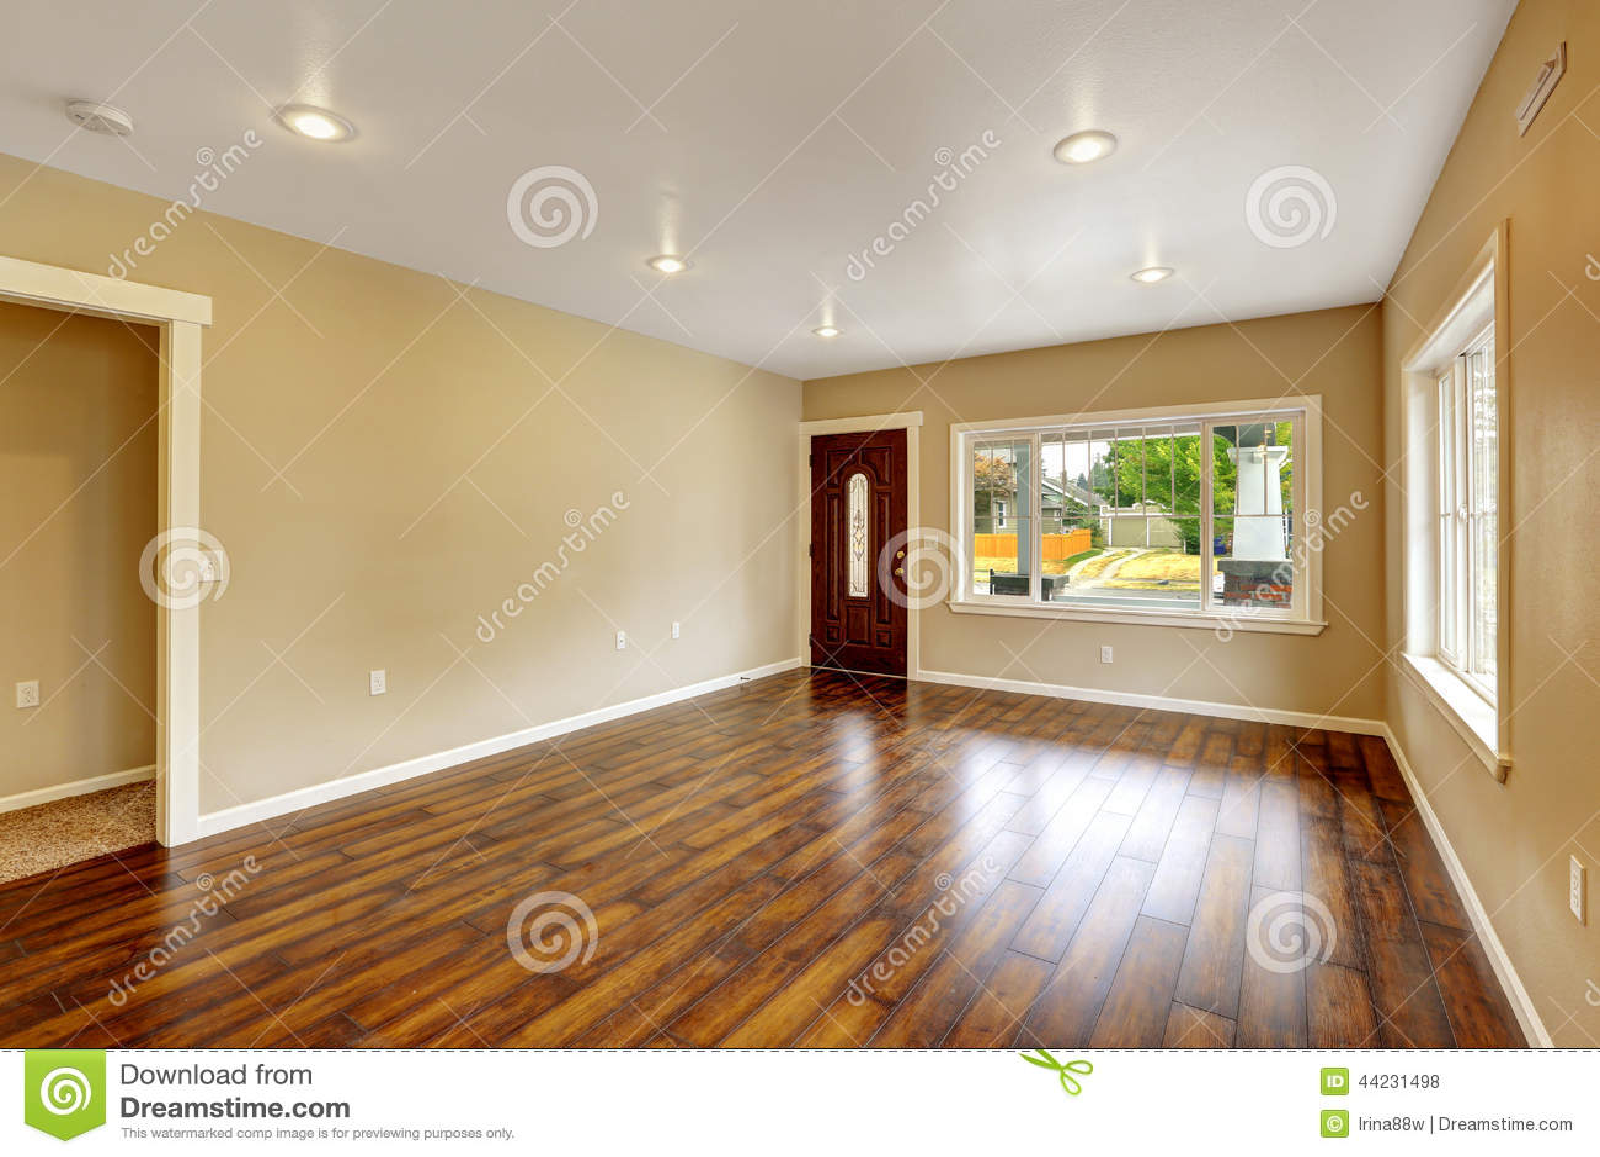 Leeg huisbinnenland ruime woonkamer met nieuwe hardhoutflo stock